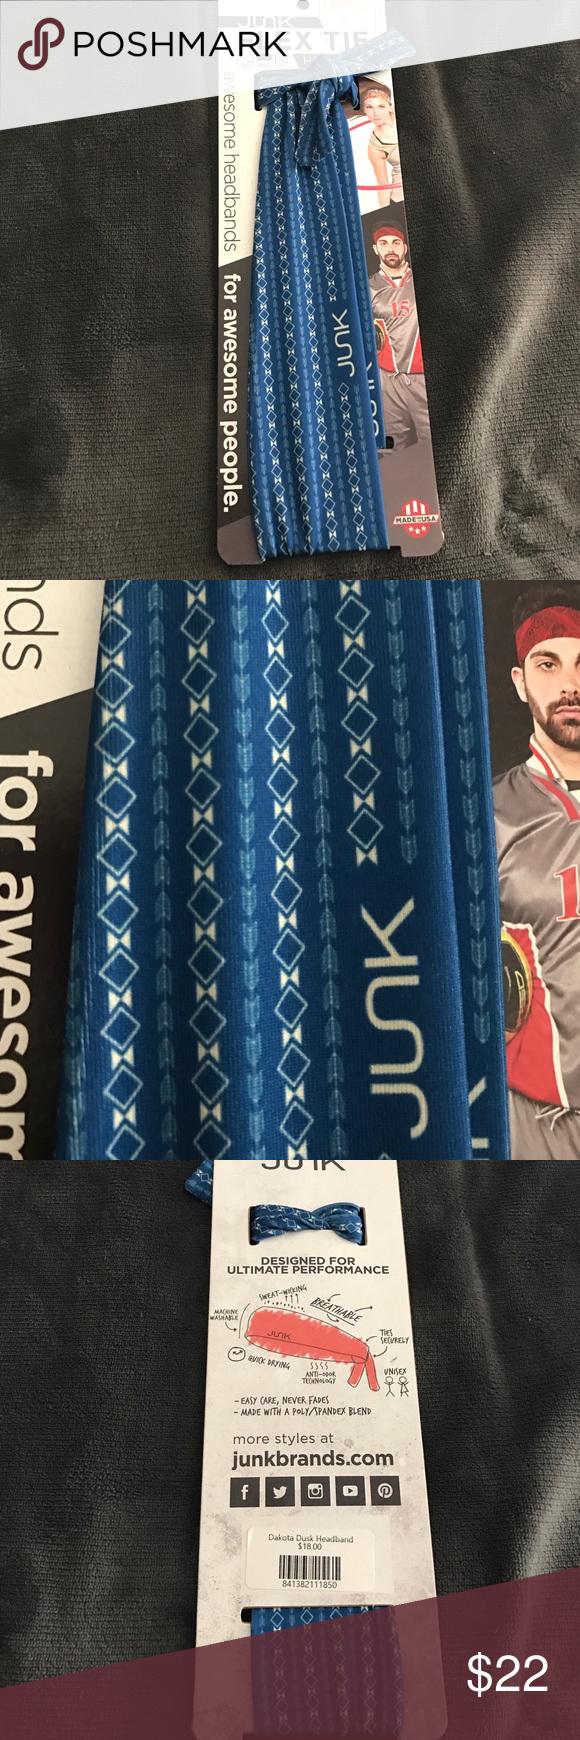 NWT JUNK Brand HeadBand NWT JUNK Brand Flex Tie HeadBand. Machine Washable. Moisture wicking fabric Accessories